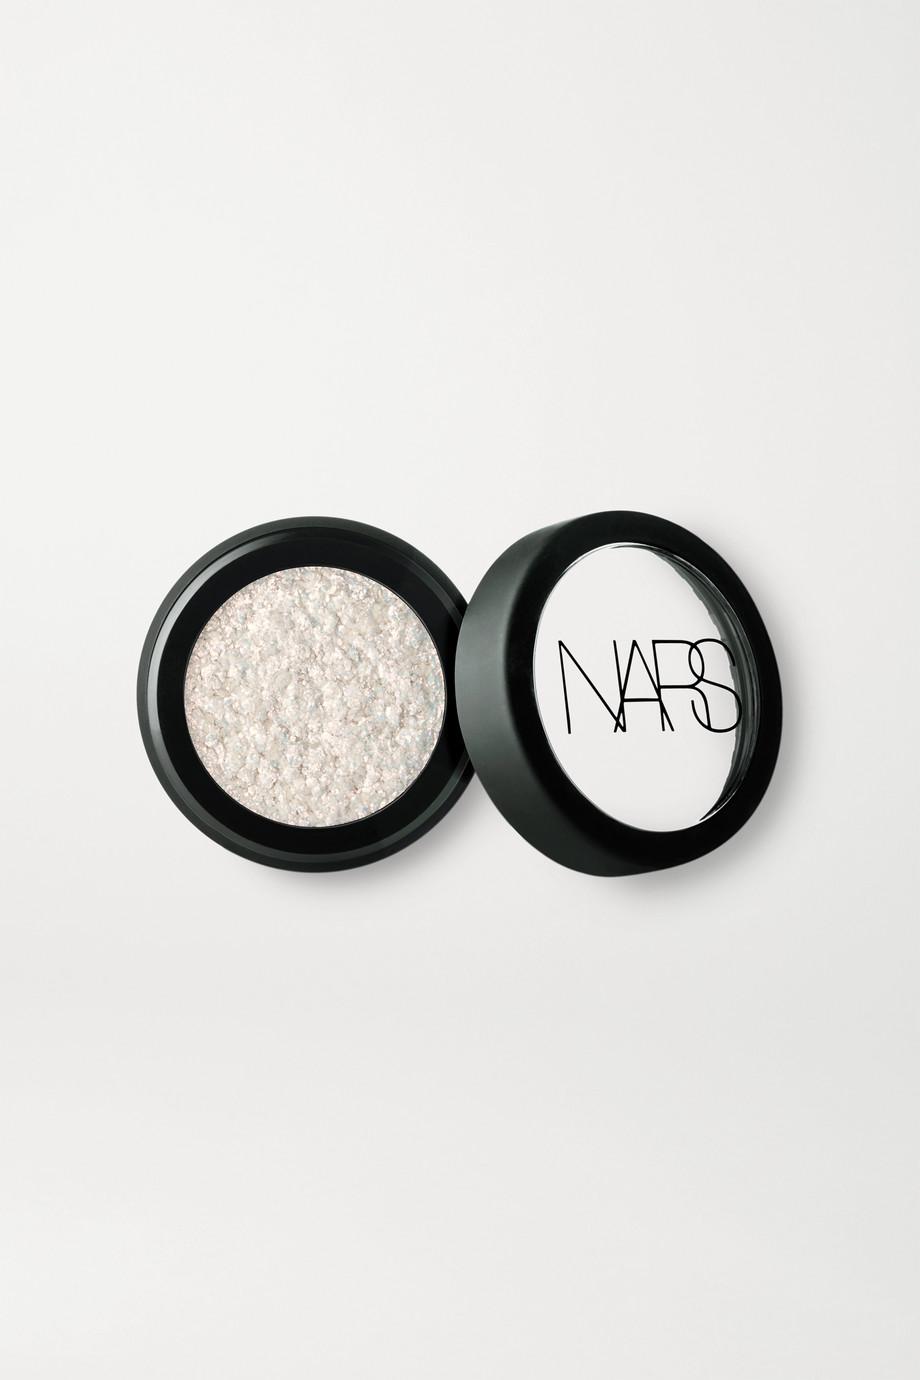 NARS Powerchrome Loose Eye Pigment - Castaway